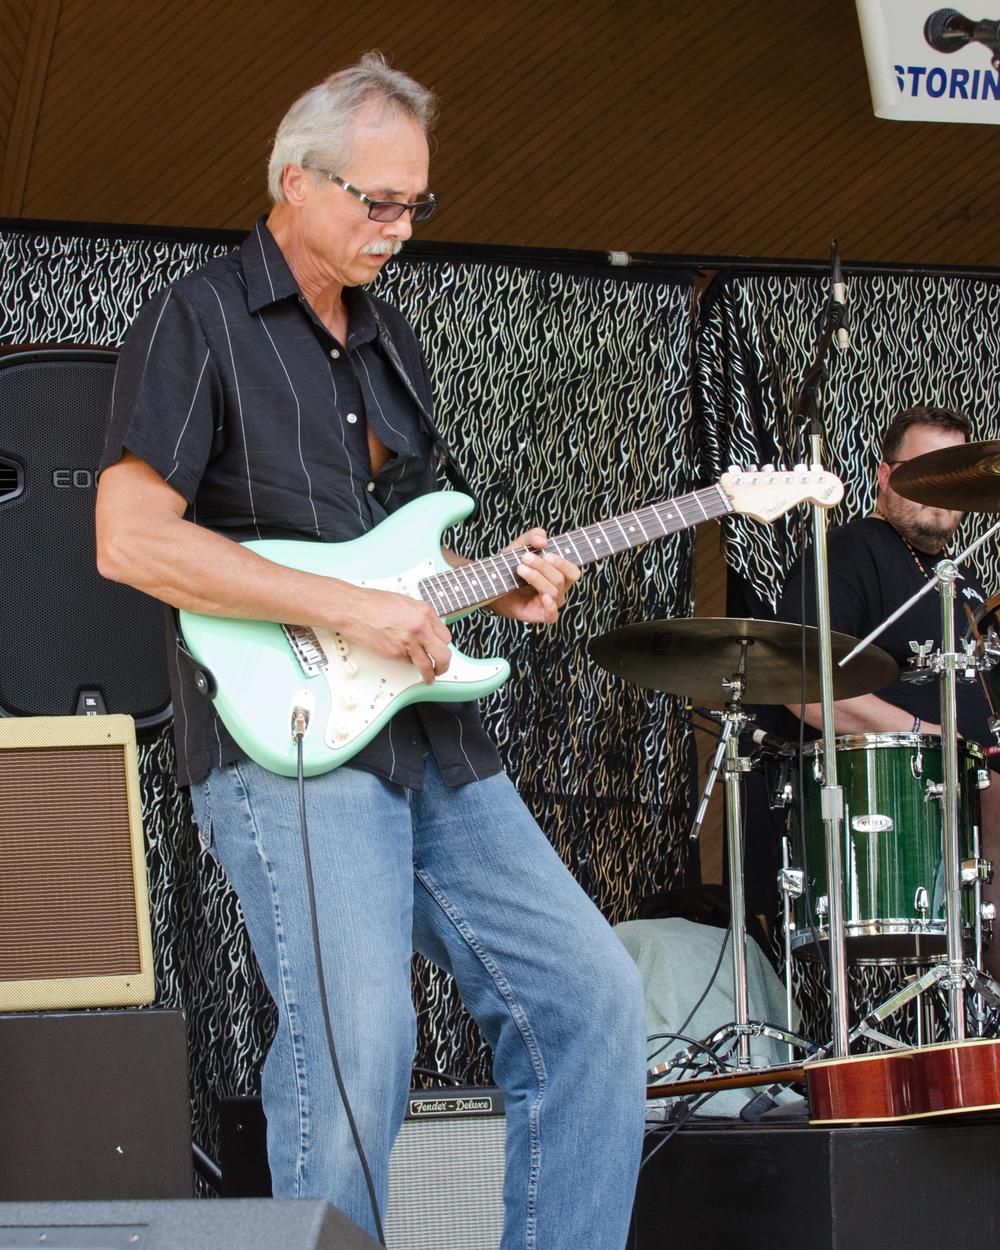 Fleetwood_Blues_Festival_2013-08-11_-134.jpg